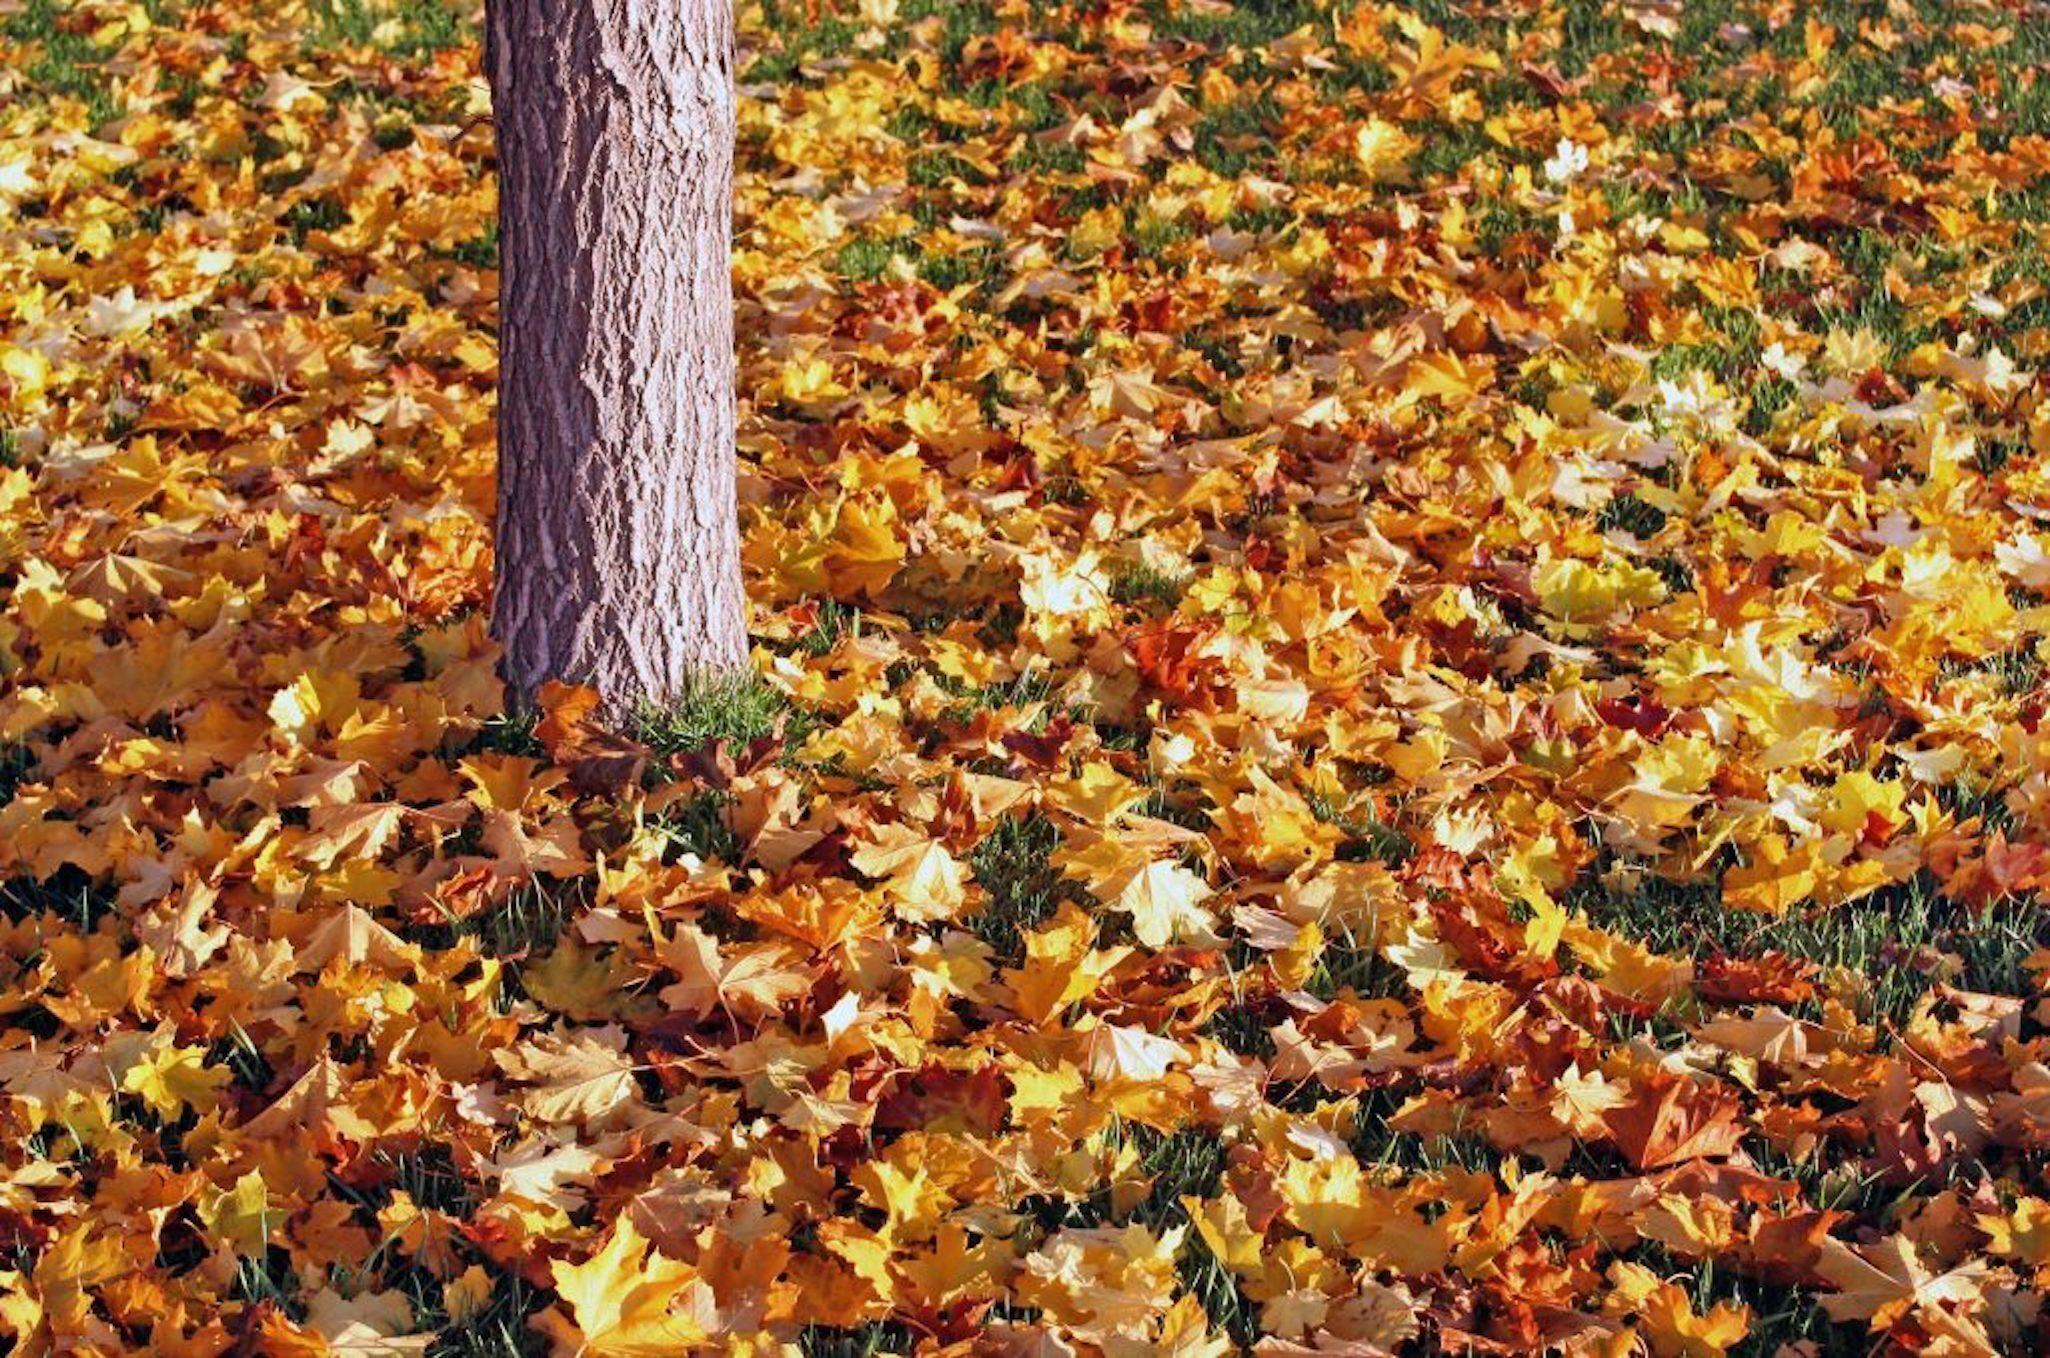 Pretty Fall Leaves On A Lawn